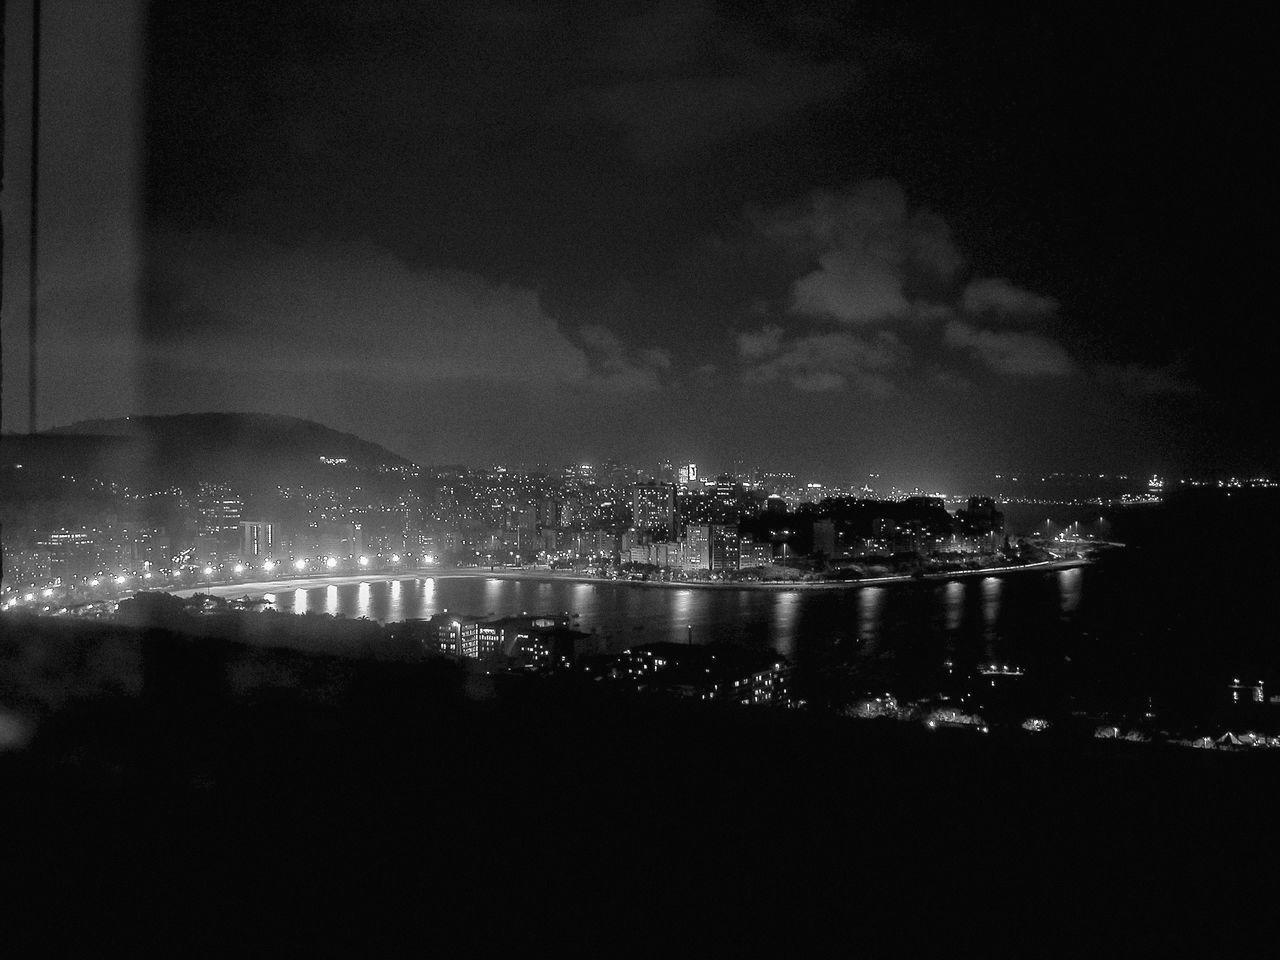 Baía De Guanabara Blackandwhite Photography Capital Cities  City City Life Cityscape Dark Illuminated Night Rio De Janeiro Rio De Janeiro Eyeem Fotos Collection⛵ Scenics Sky Travel Destinations Water Cities At Night